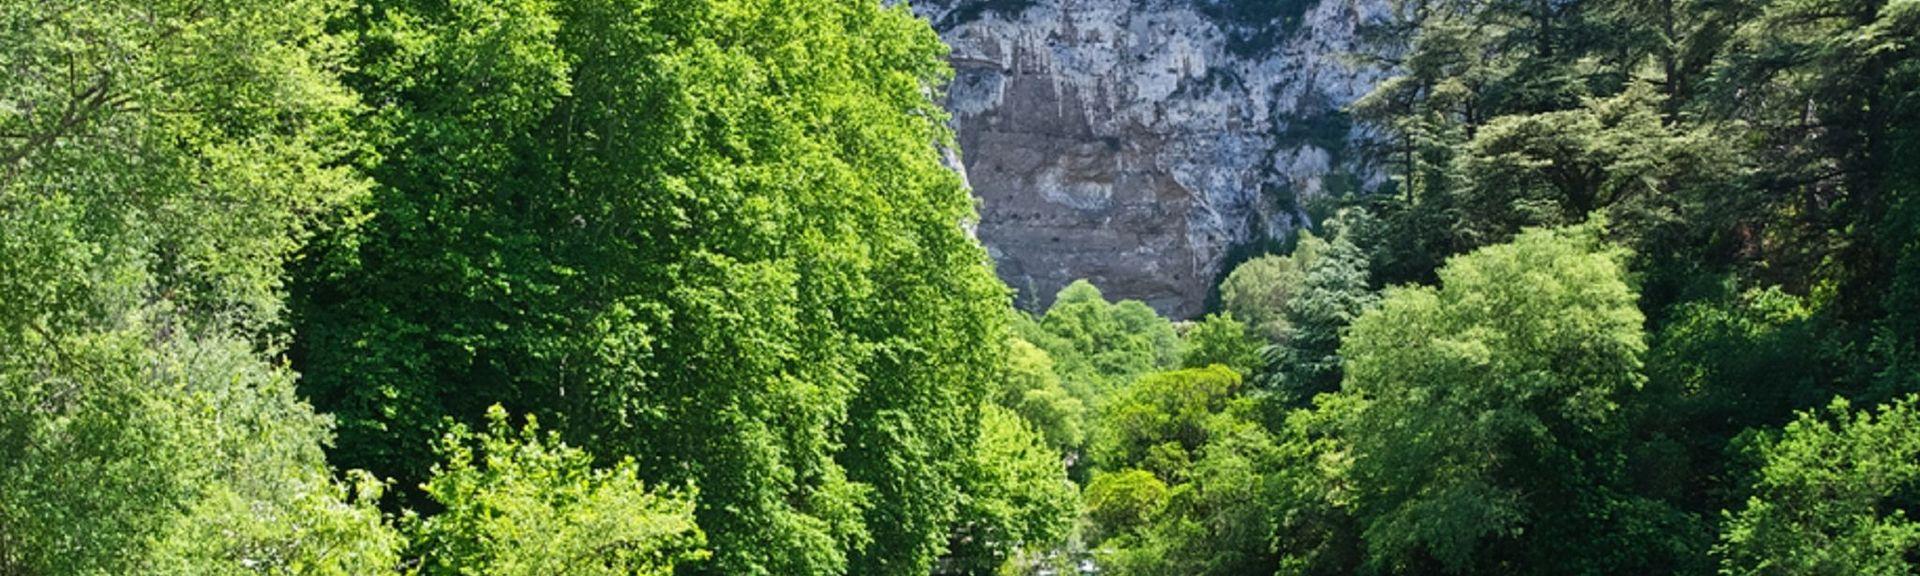 Cheval-Blanc, Vaucluse (departement), Frankrijk